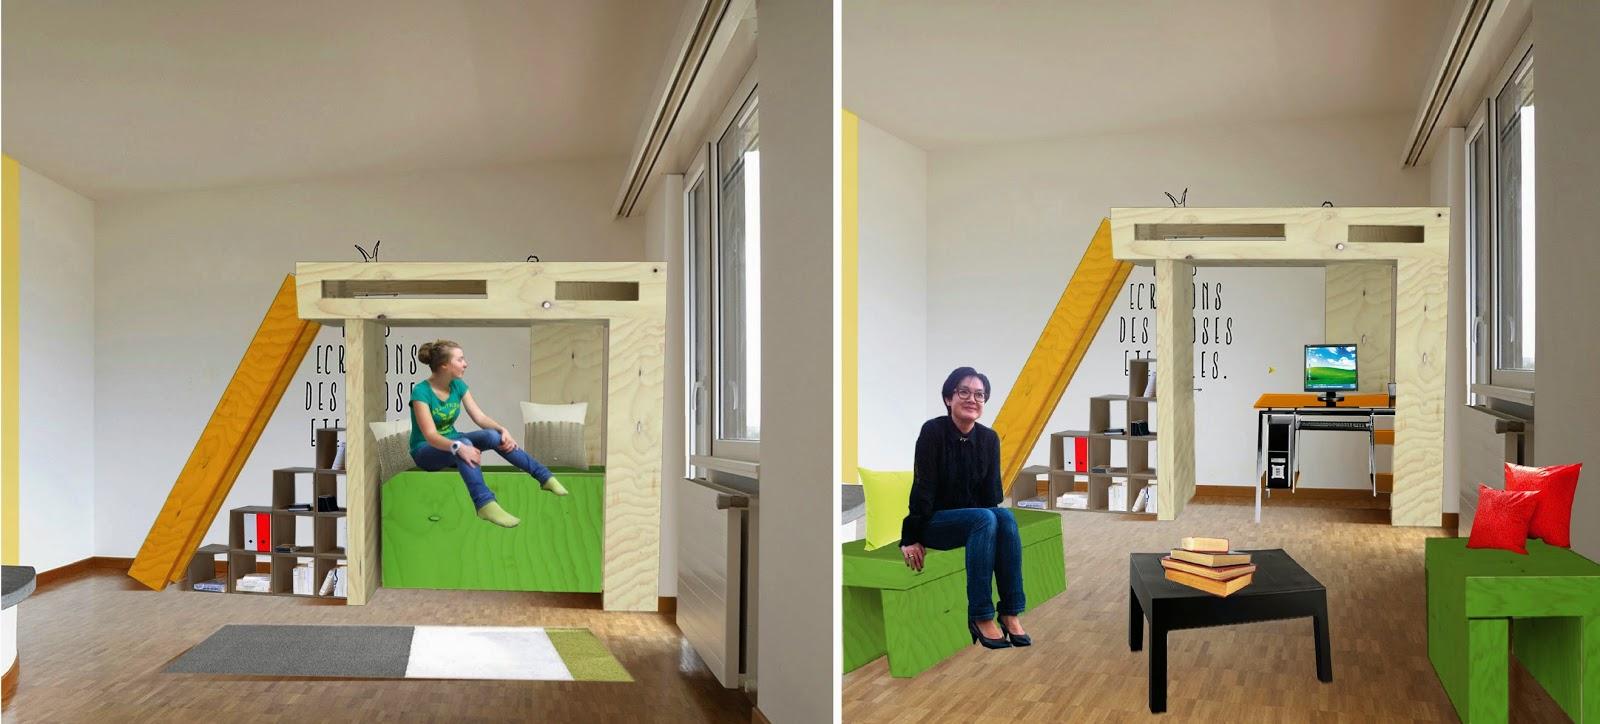 bts design produit lyc e m zeray argentan. Black Bedroom Furniture Sets. Home Design Ideas